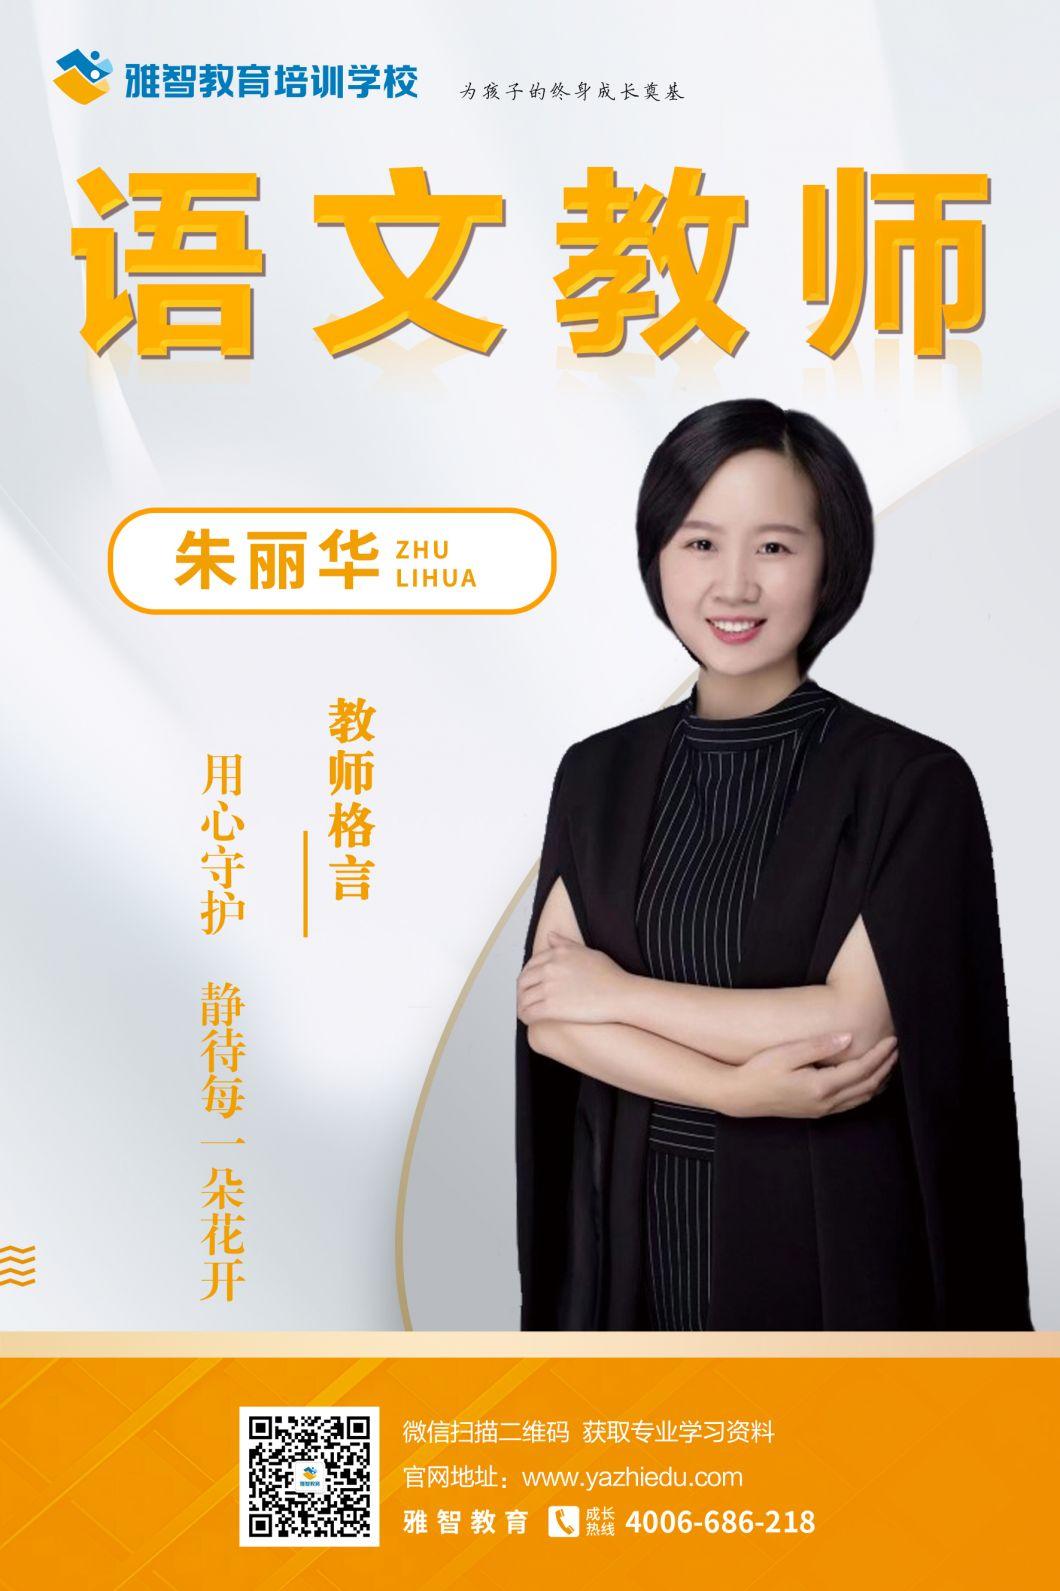 /uploads/image/2021/06/04/朱丽华.jpg